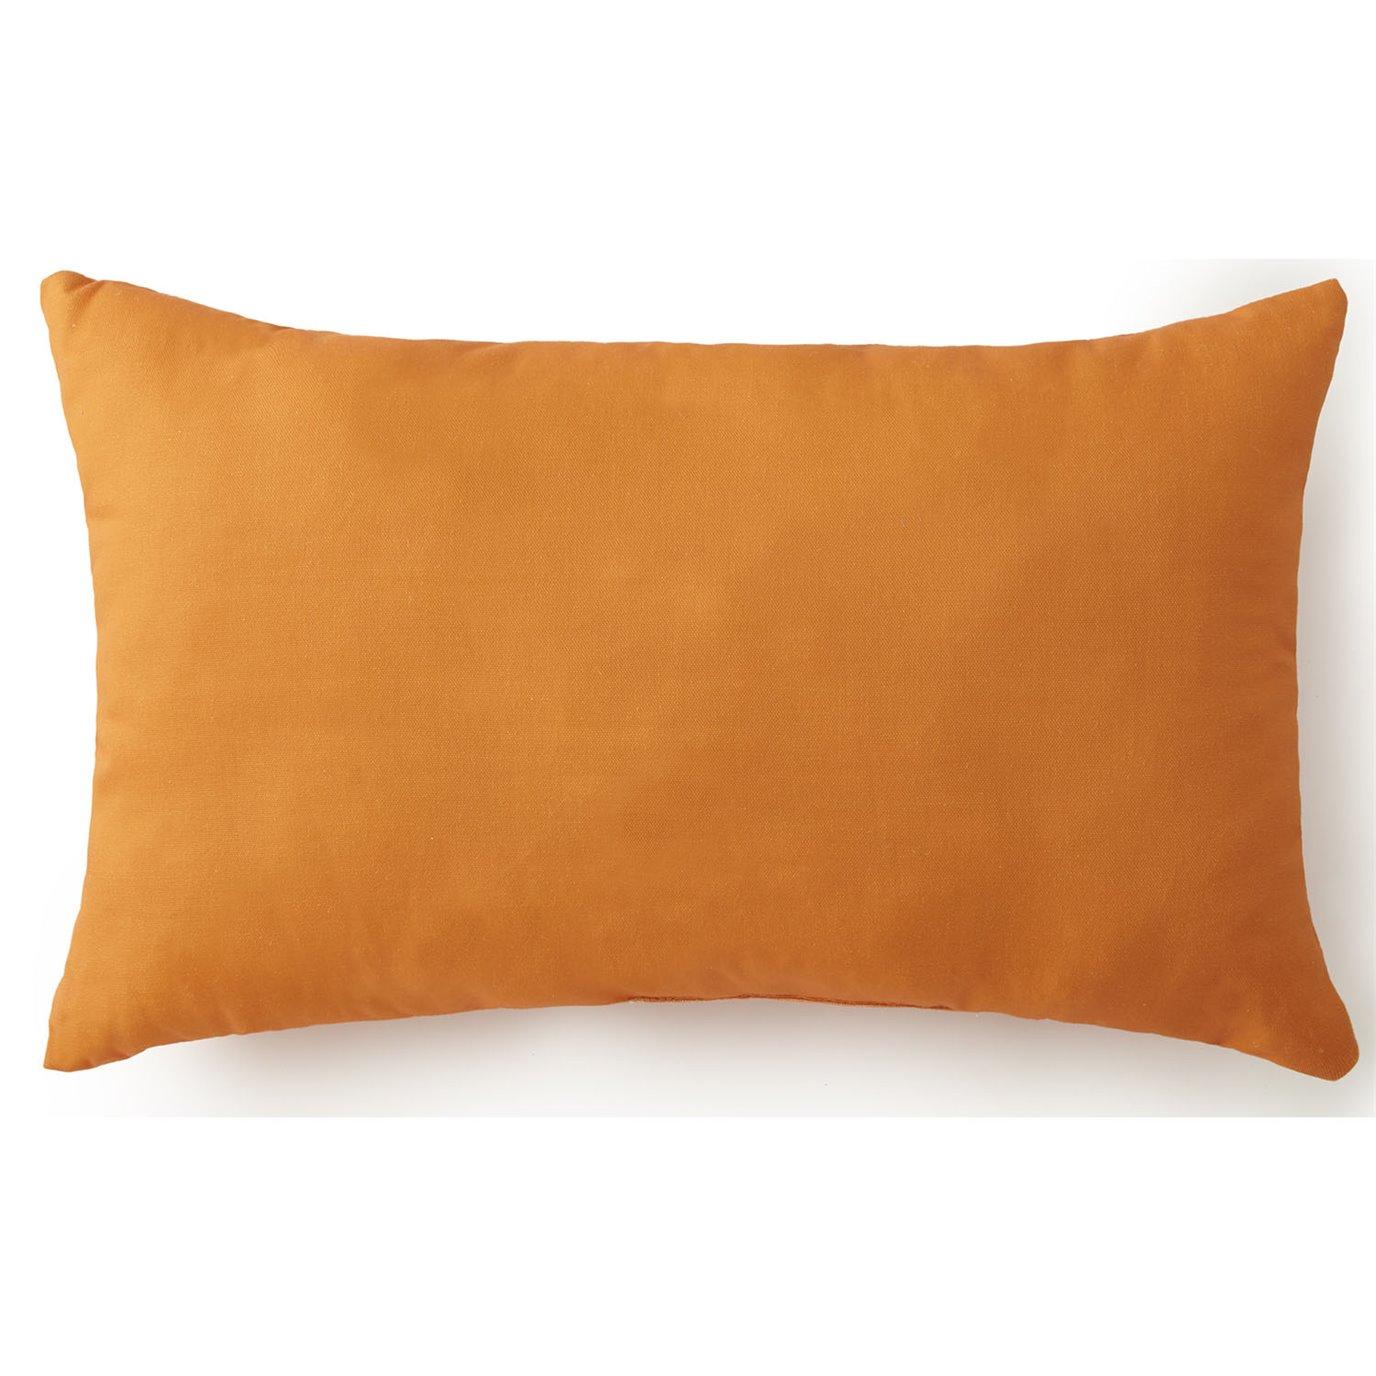 Nautical Board Long Rectangle Cushion - Solid Orange